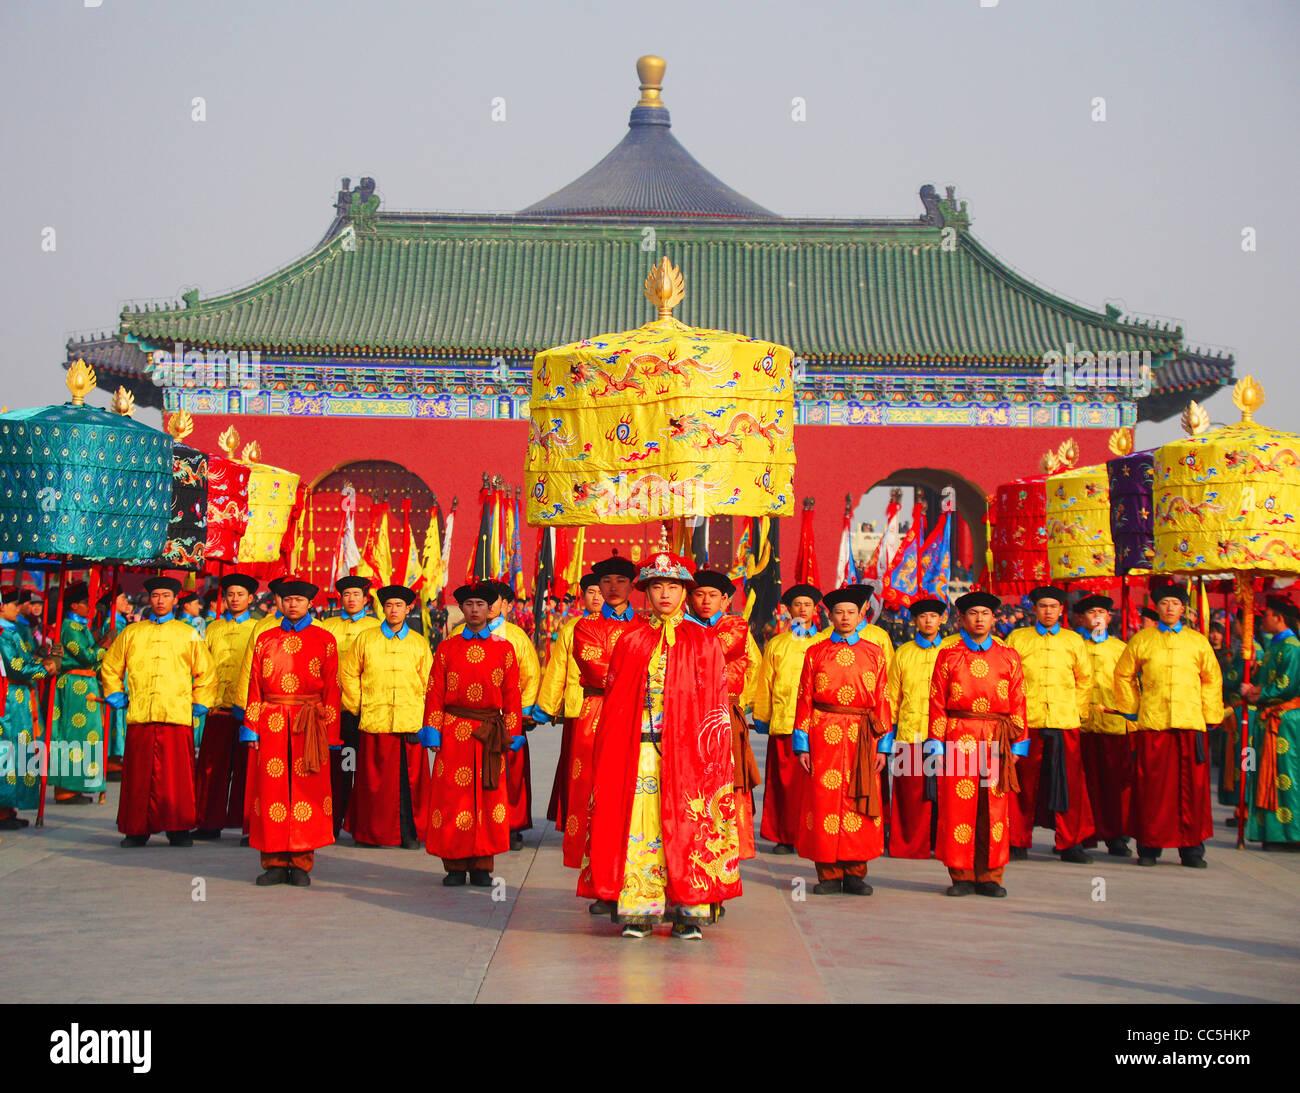 Verehren Himmel Zeremonie im Himmelstempel, Beijing, China Stockbild